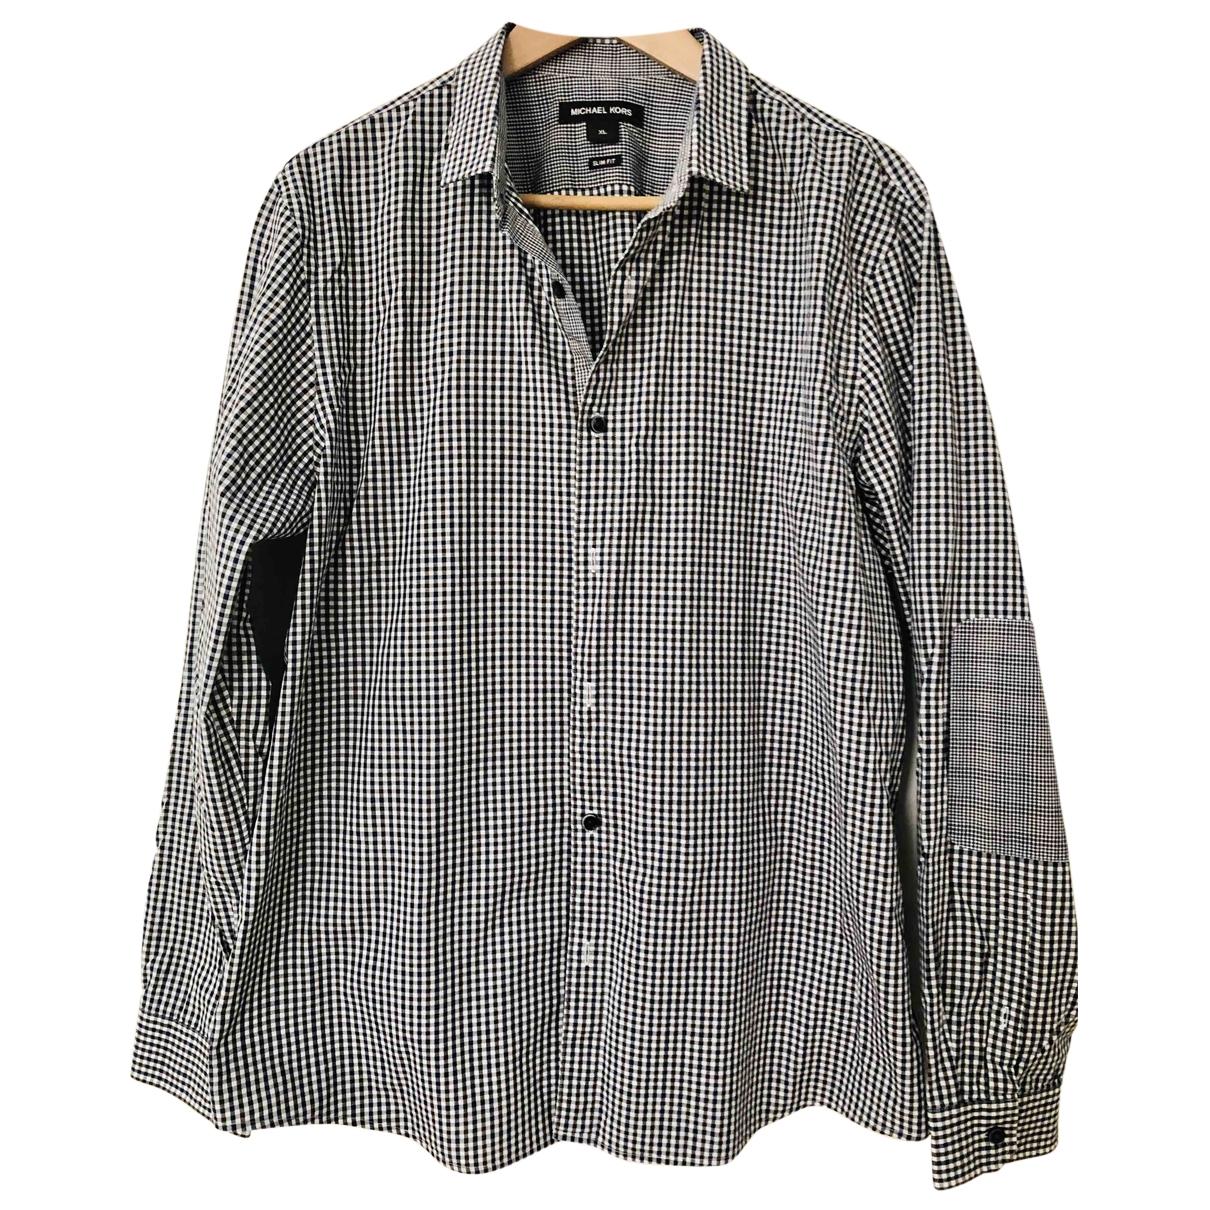 Michael Kors \N Black Cotton Shirts for Men XL International